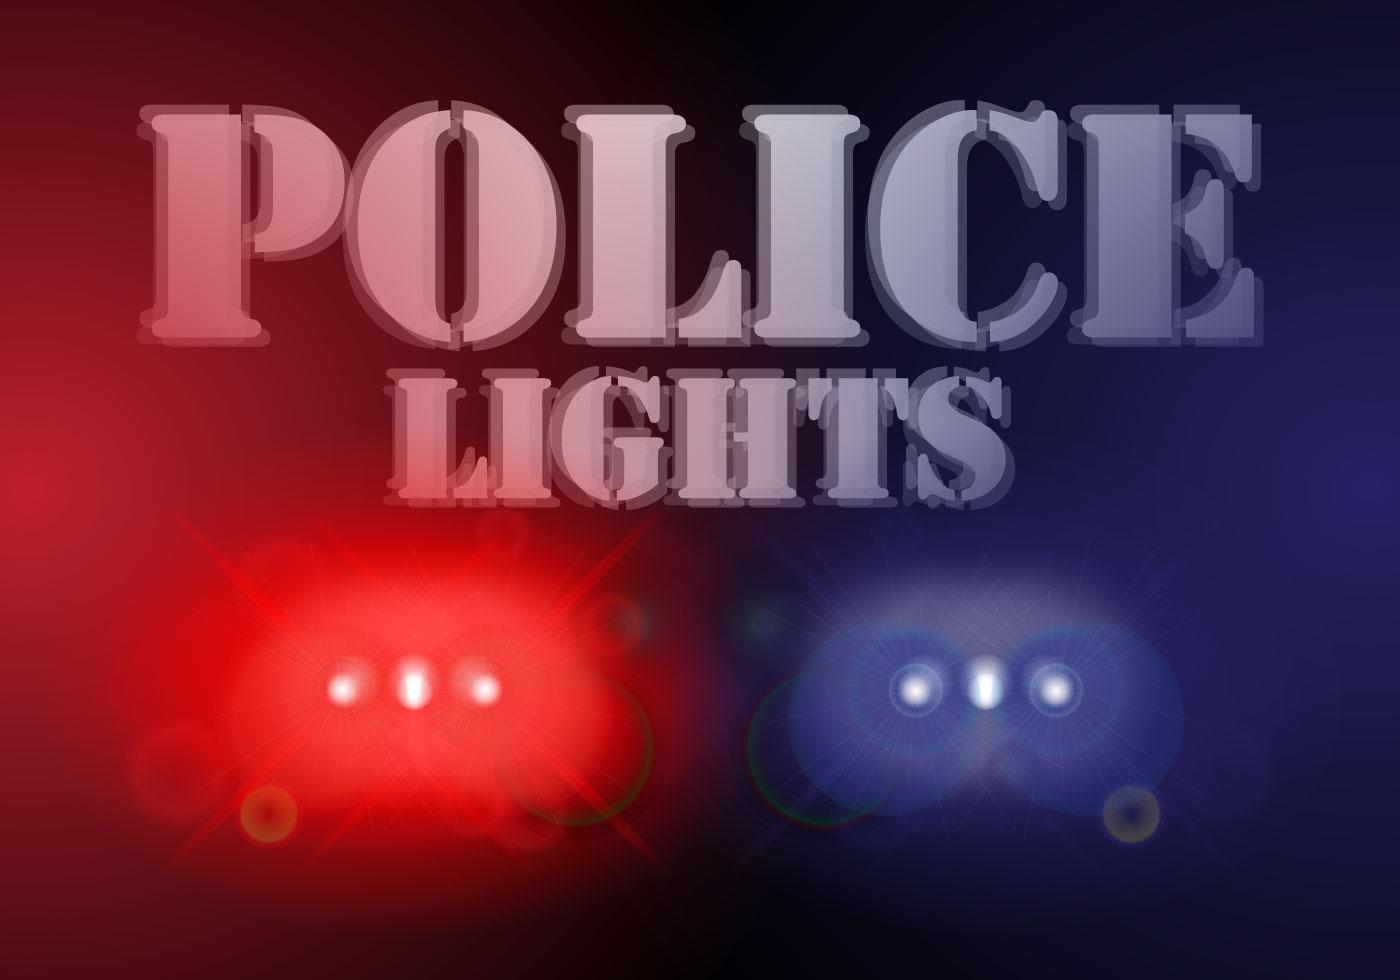 Police Lights Background Vector Download Free Vector Art